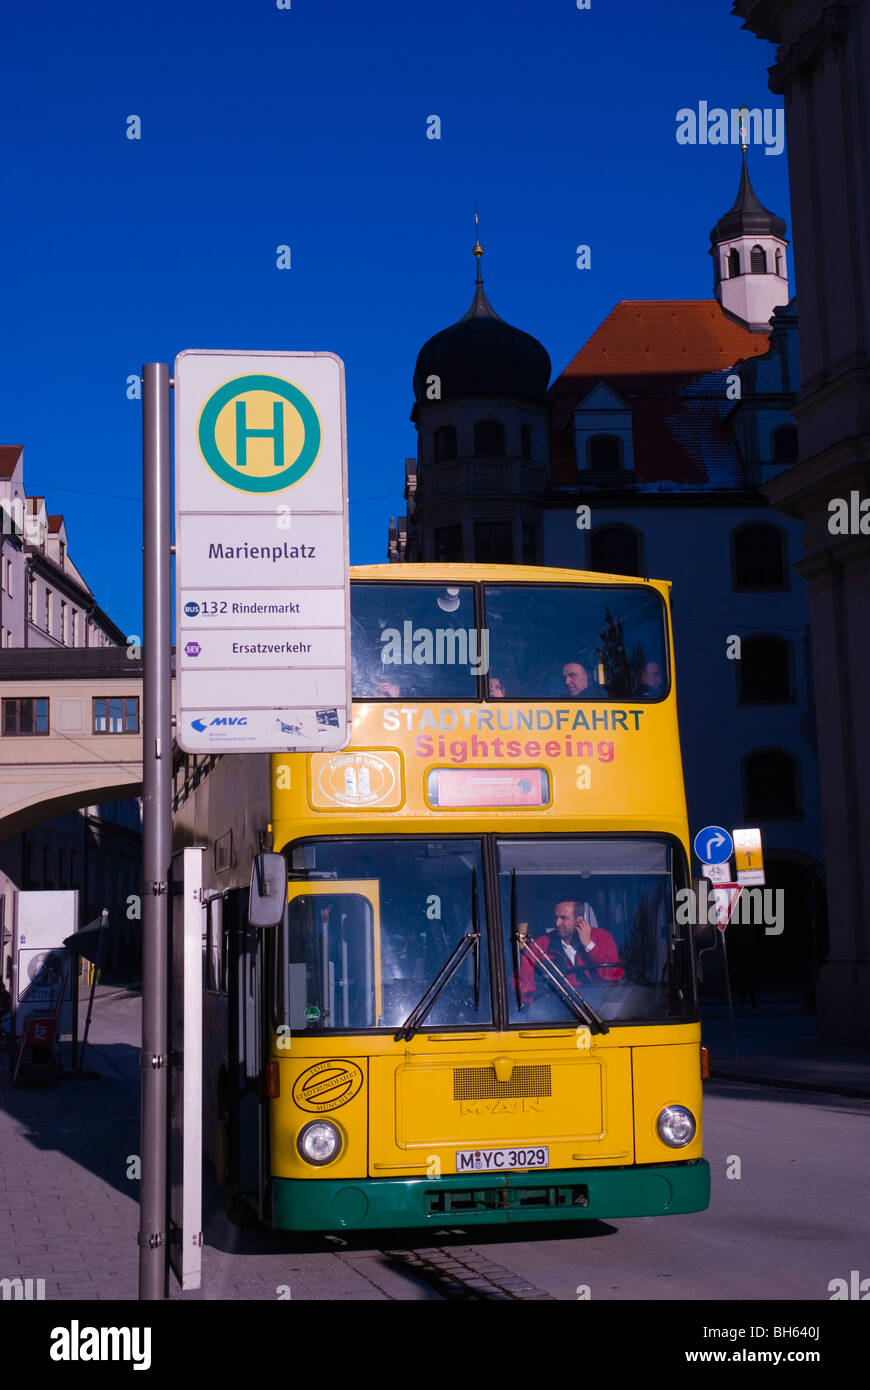 bus stop german germany stockfotos bus stop german germany bilder alamy. Black Bedroom Furniture Sets. Home Design Ideas